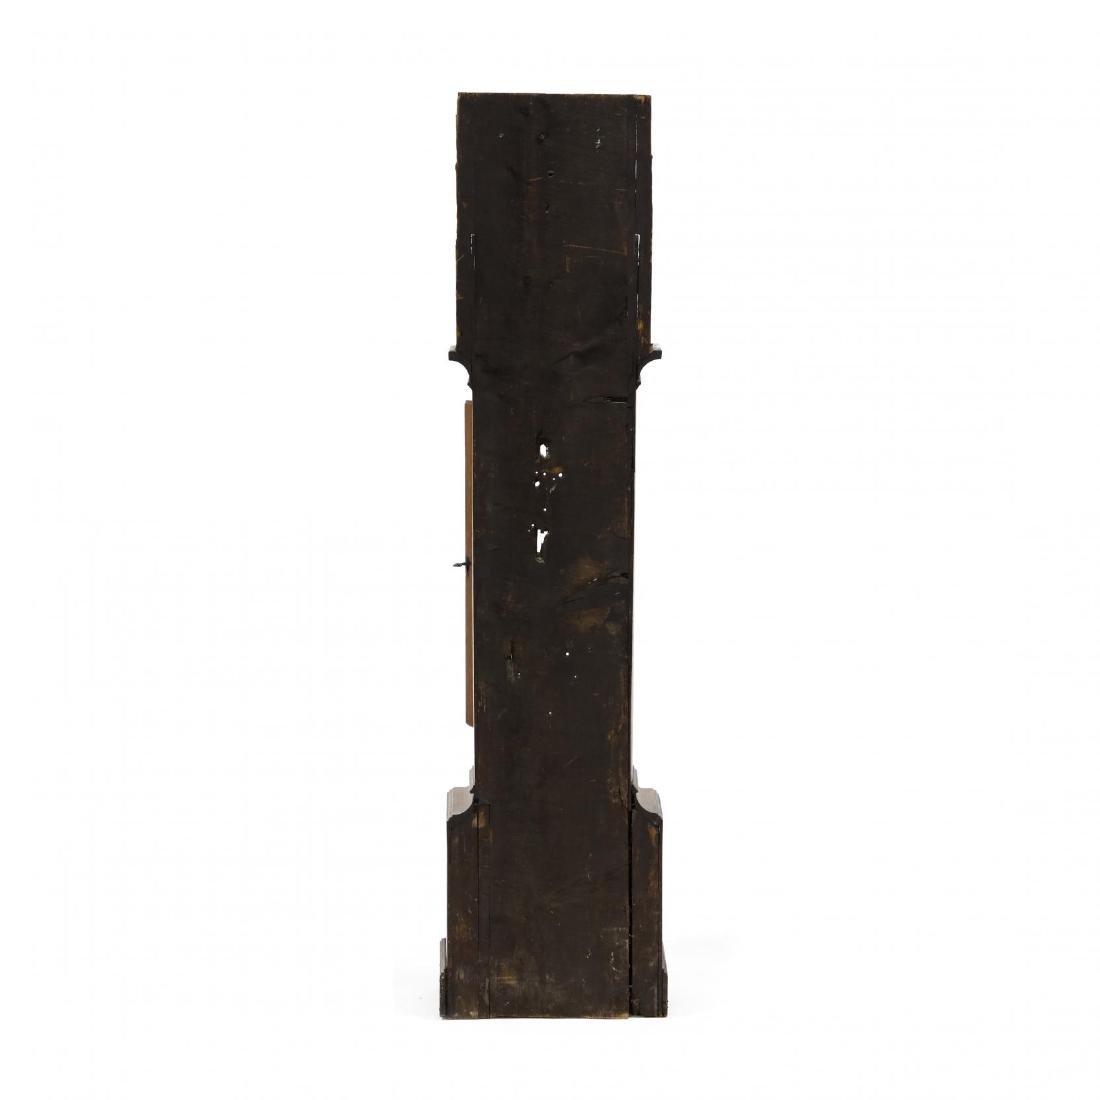 English Tall Case Clock, Richard Kenyon - 4